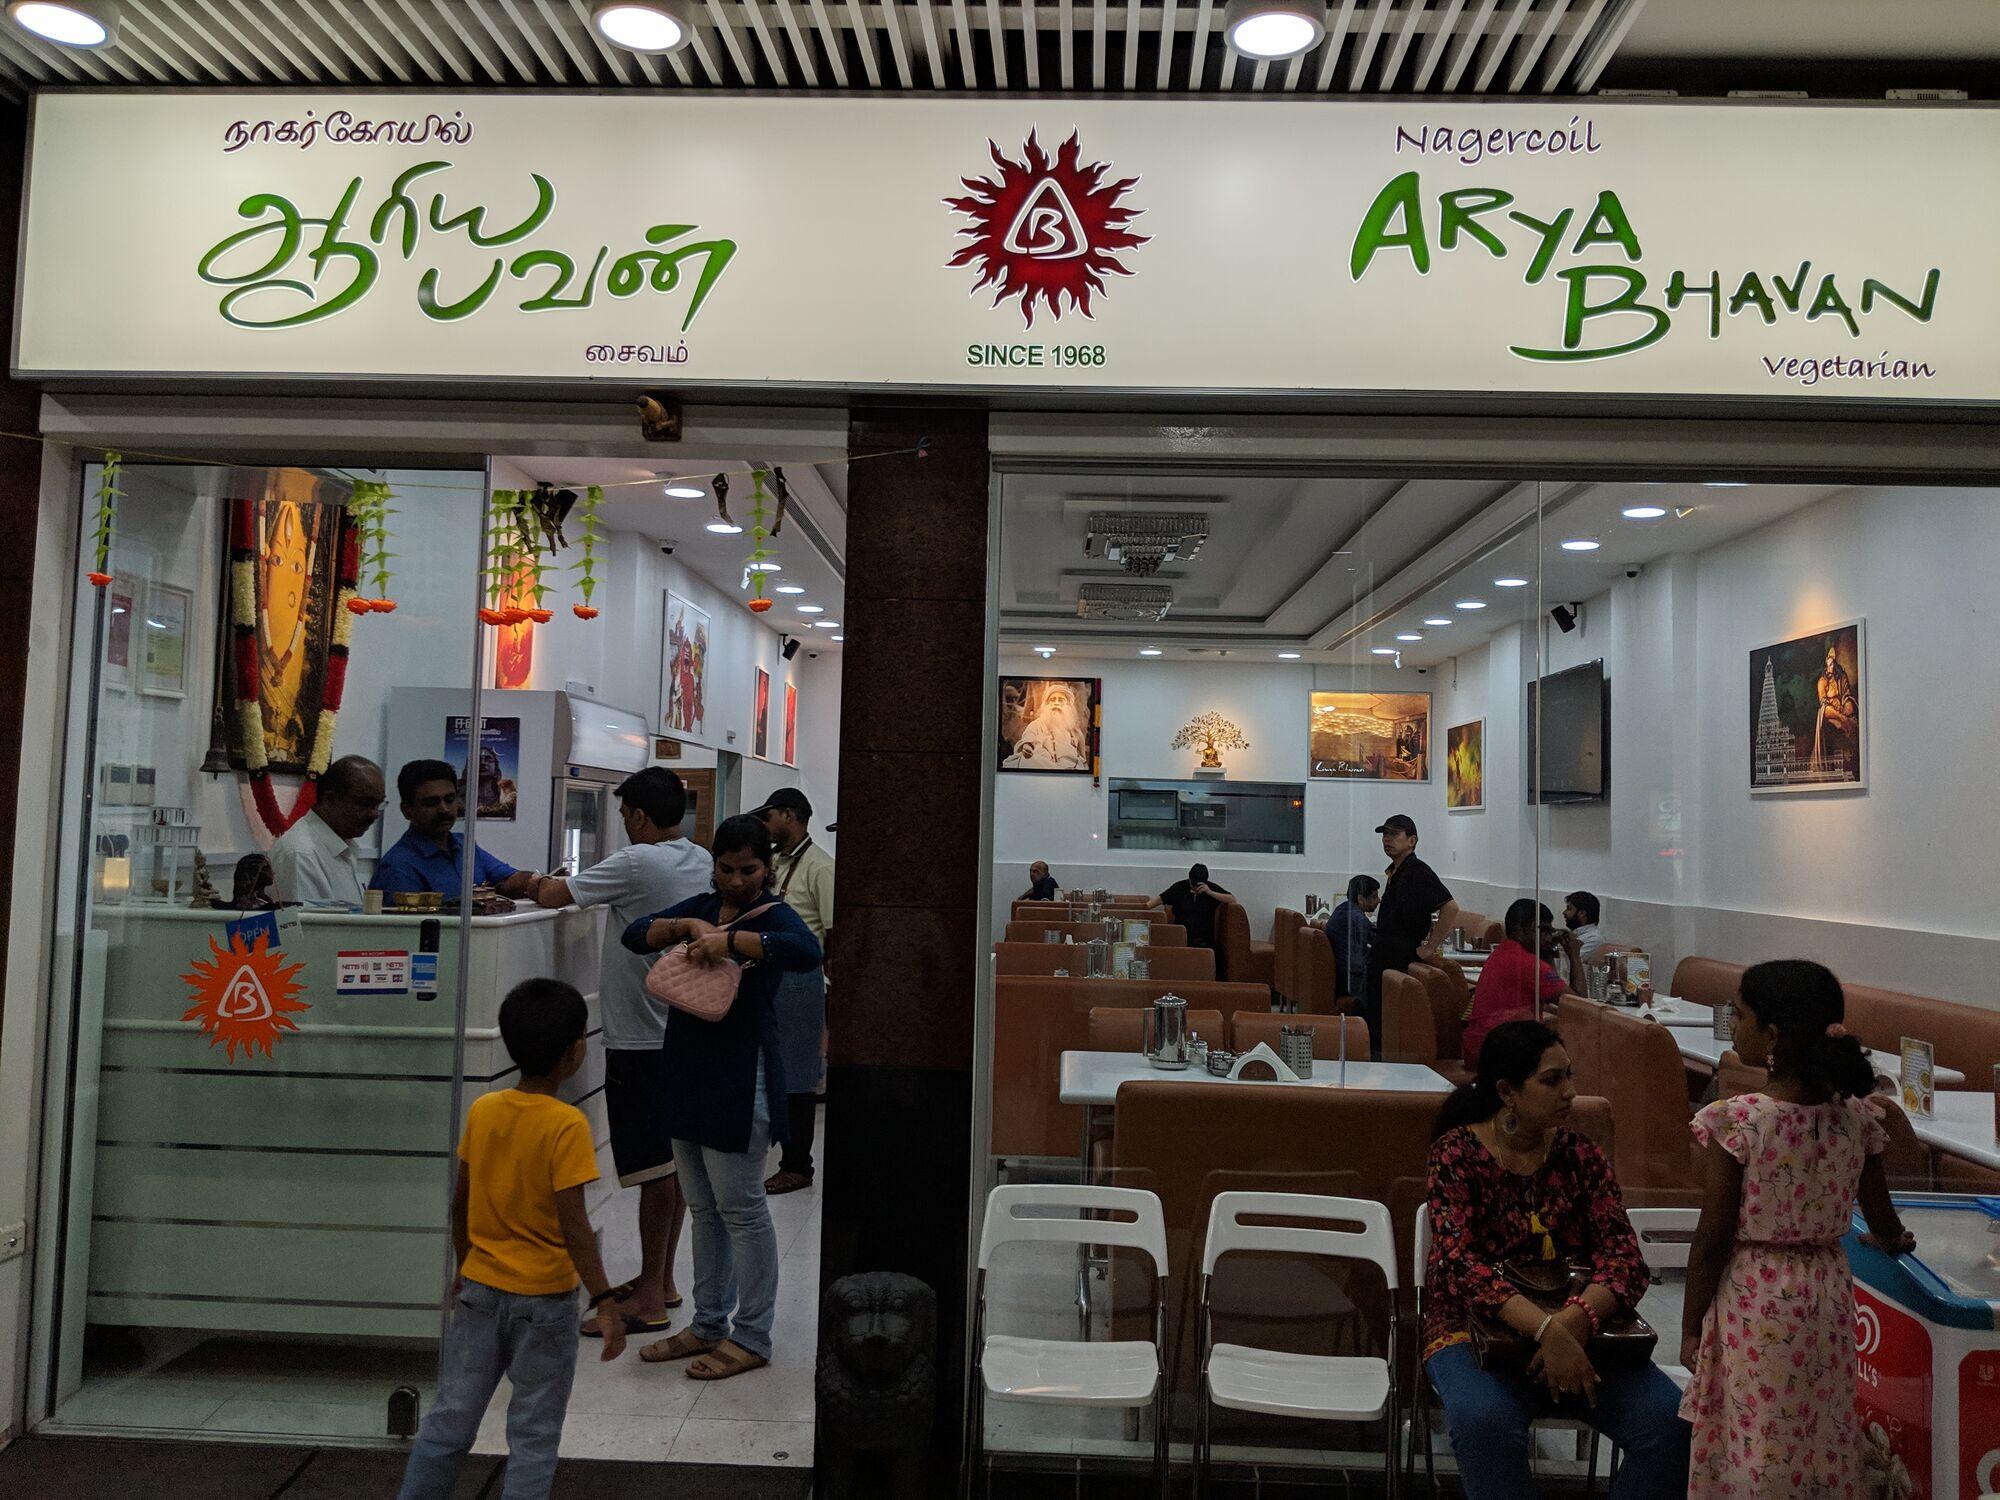 Nagercoil Arya Bhavan Vegetarian, Singapore - நாகர்கோயில் ஆரிய பவன்